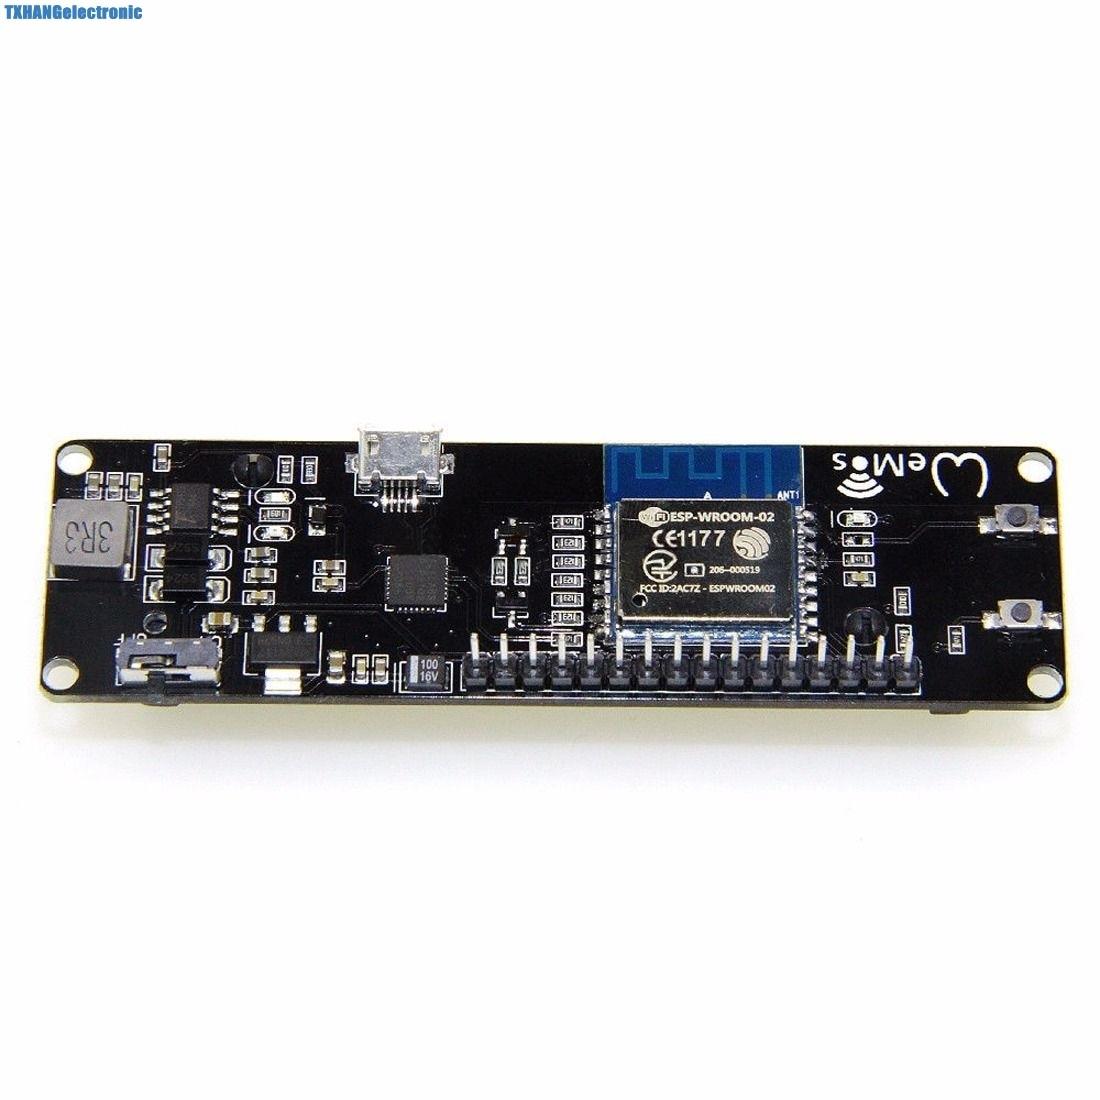 WeMos D1 ESP-Wroom-02 ESP8266 Nodemcu WiFi Module With 18650 Battery Charging